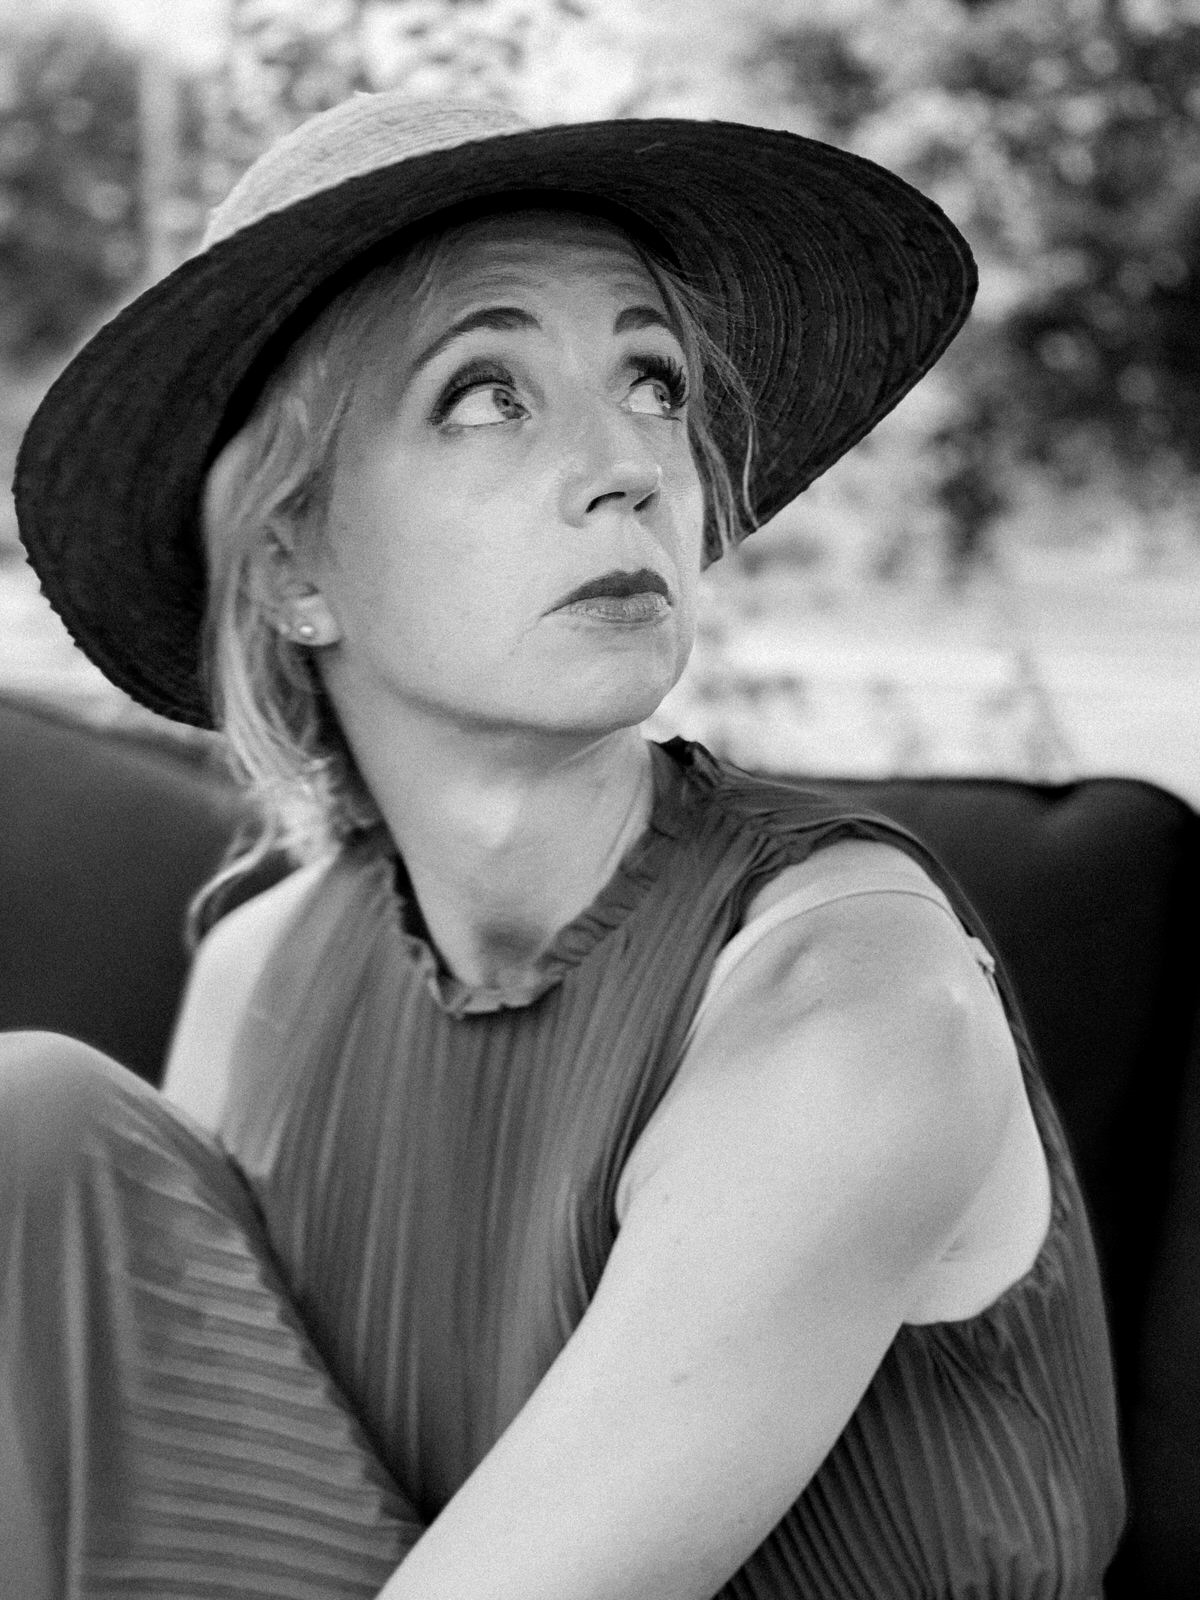 Self-Portrait-black-and-white-Fine-Art-Photography-by-Studio-L-Photographer-Laura-Schneider-_0980